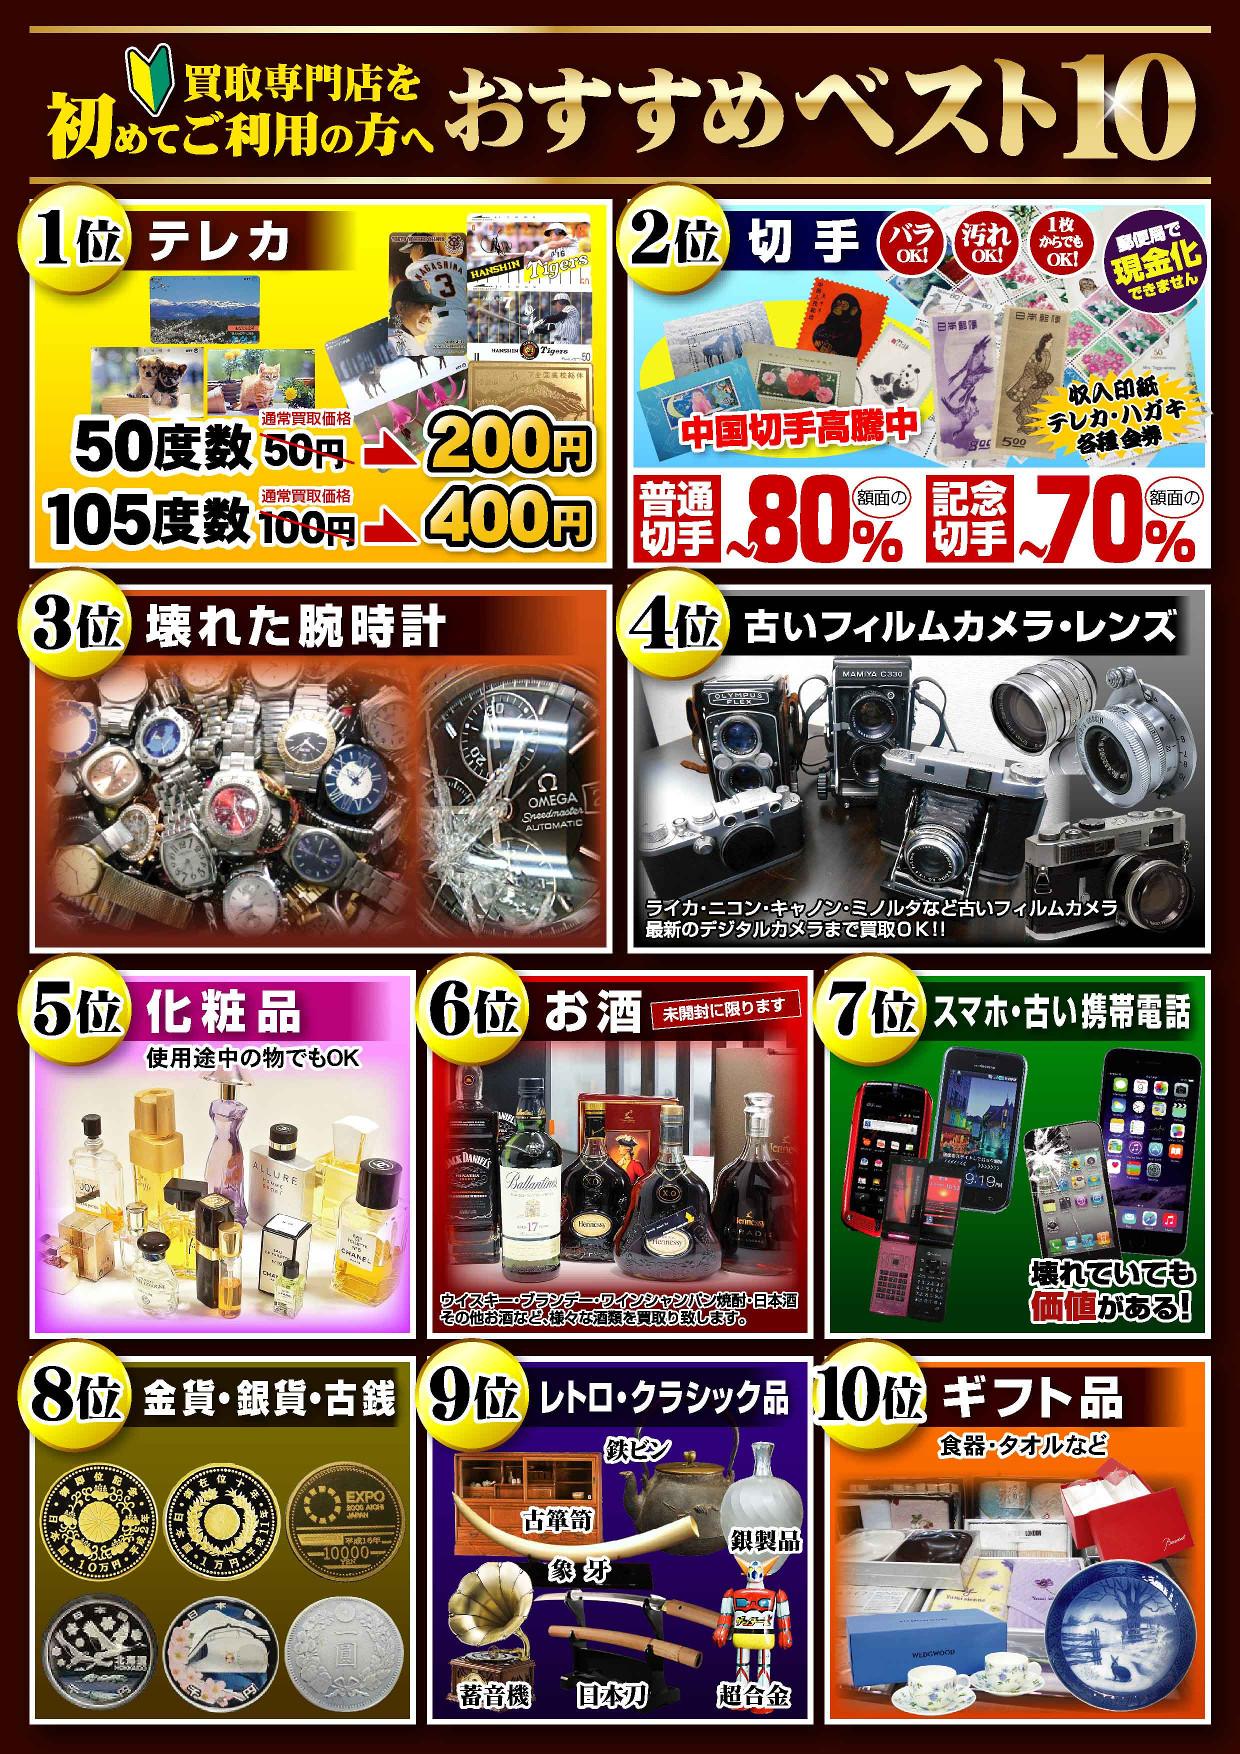 http://www.recyclemart-sakai.com/A4%E3%81%8A%E3%81%99%E3%81%99%E3%82%81%E3%83%99%E3%82%B9%E3%83%88.jpg